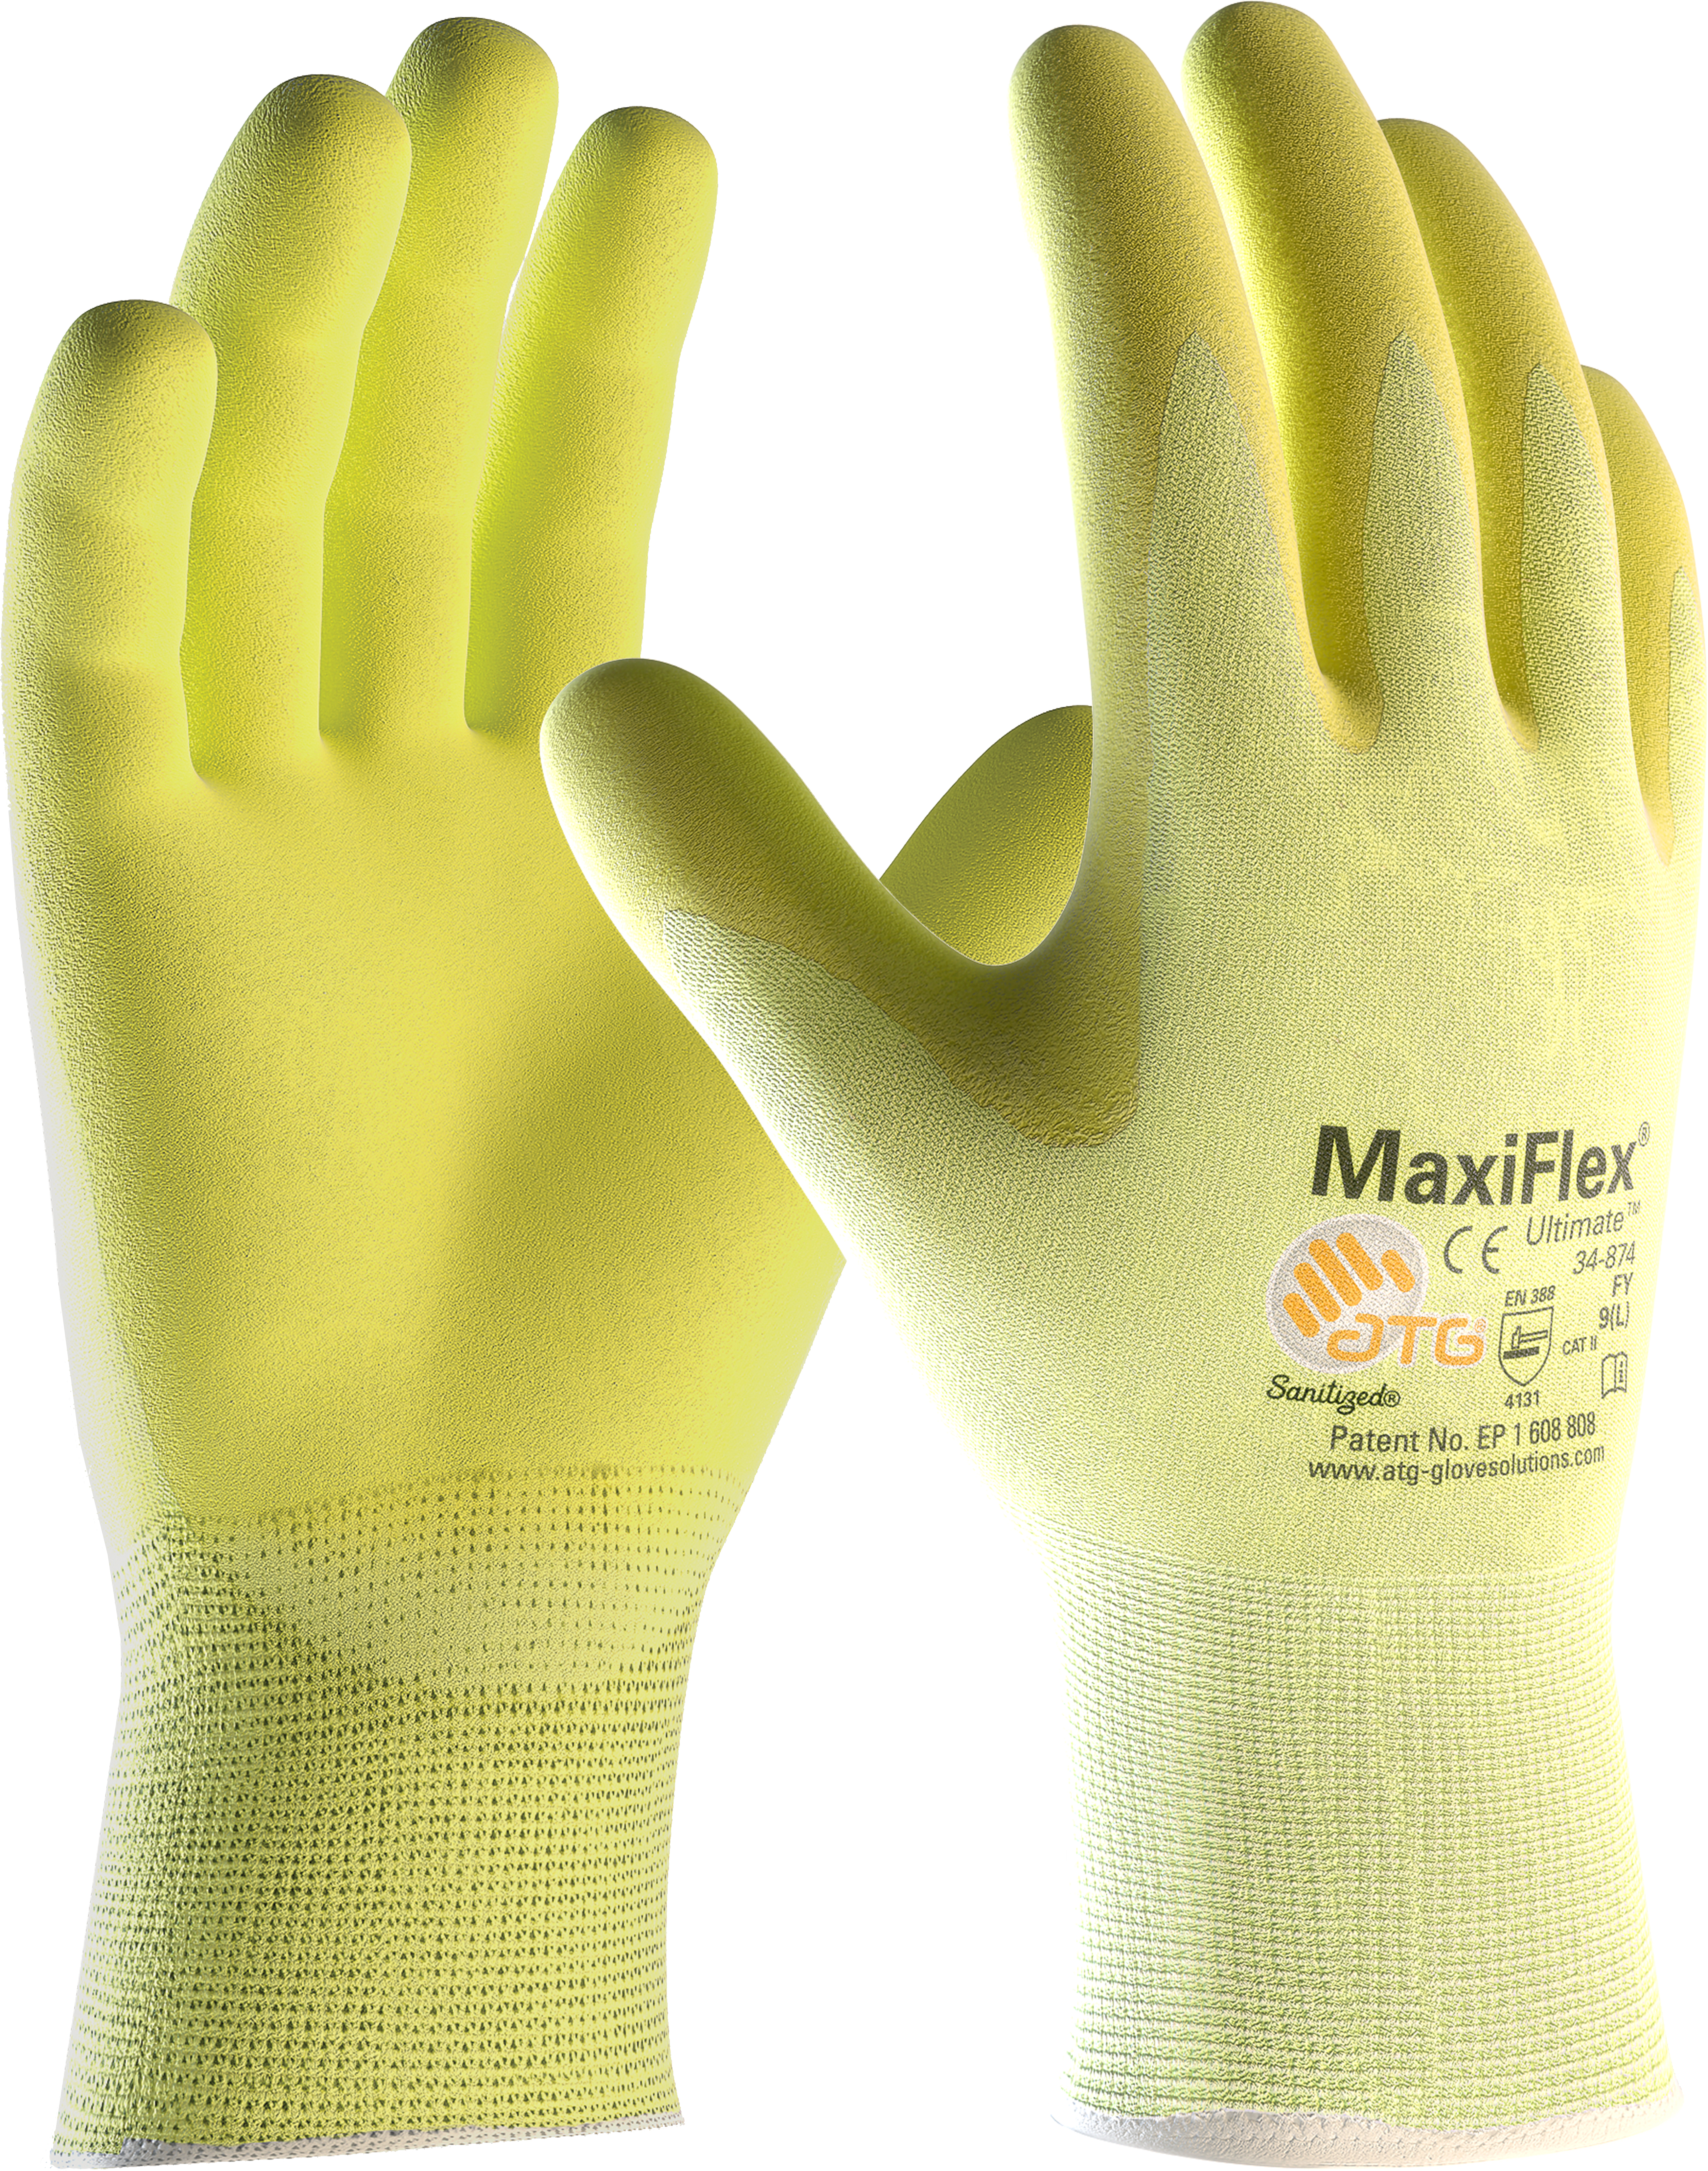 Rukavice MAXIFLEX ULTIMATE 34-874FY na stojan 06